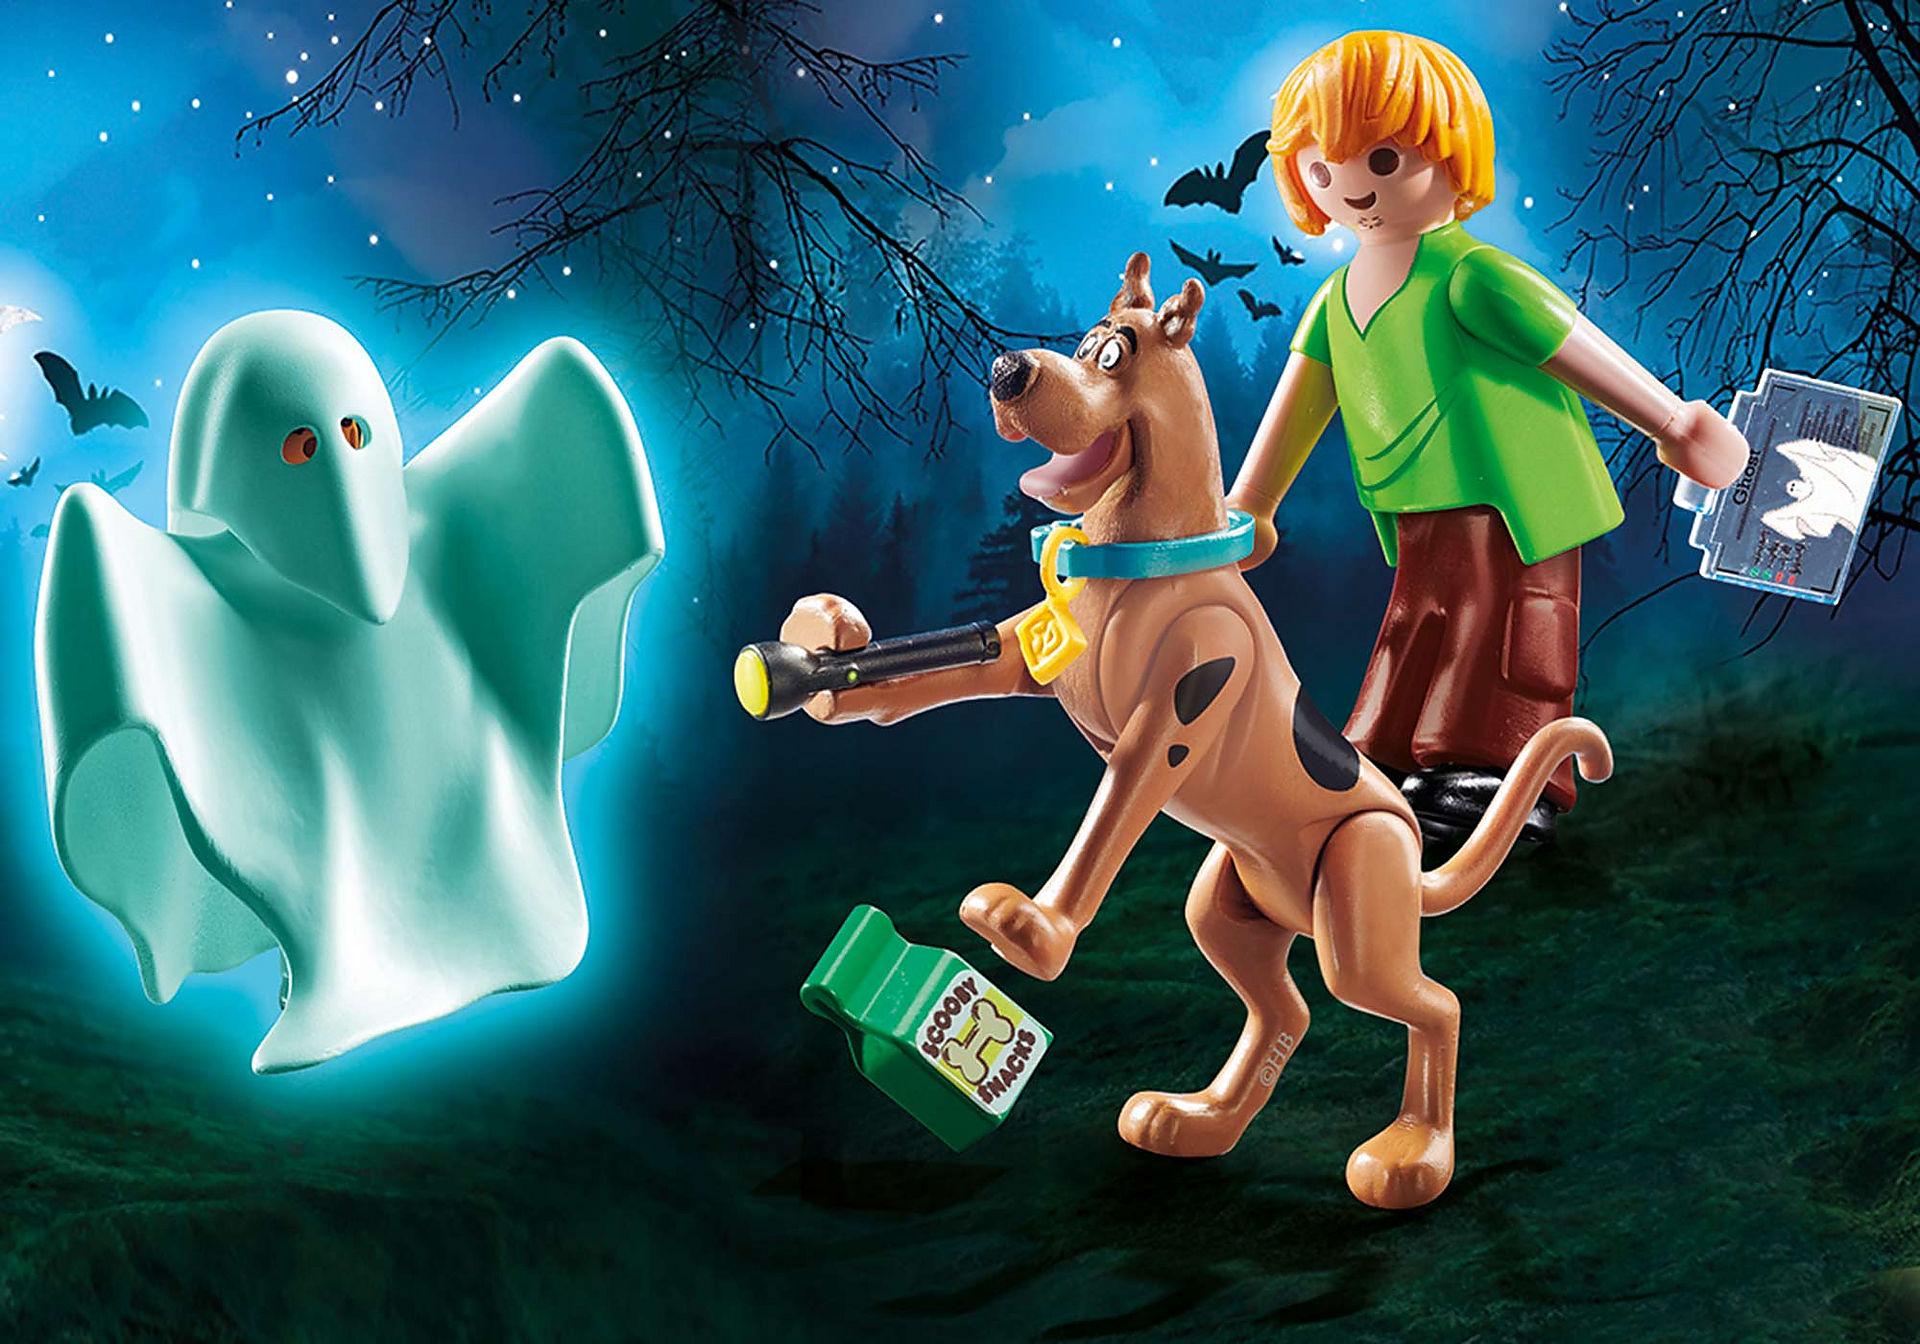 70287 SCOOBY-DOO Scooby et Shaggy com Fantasma zoom image1